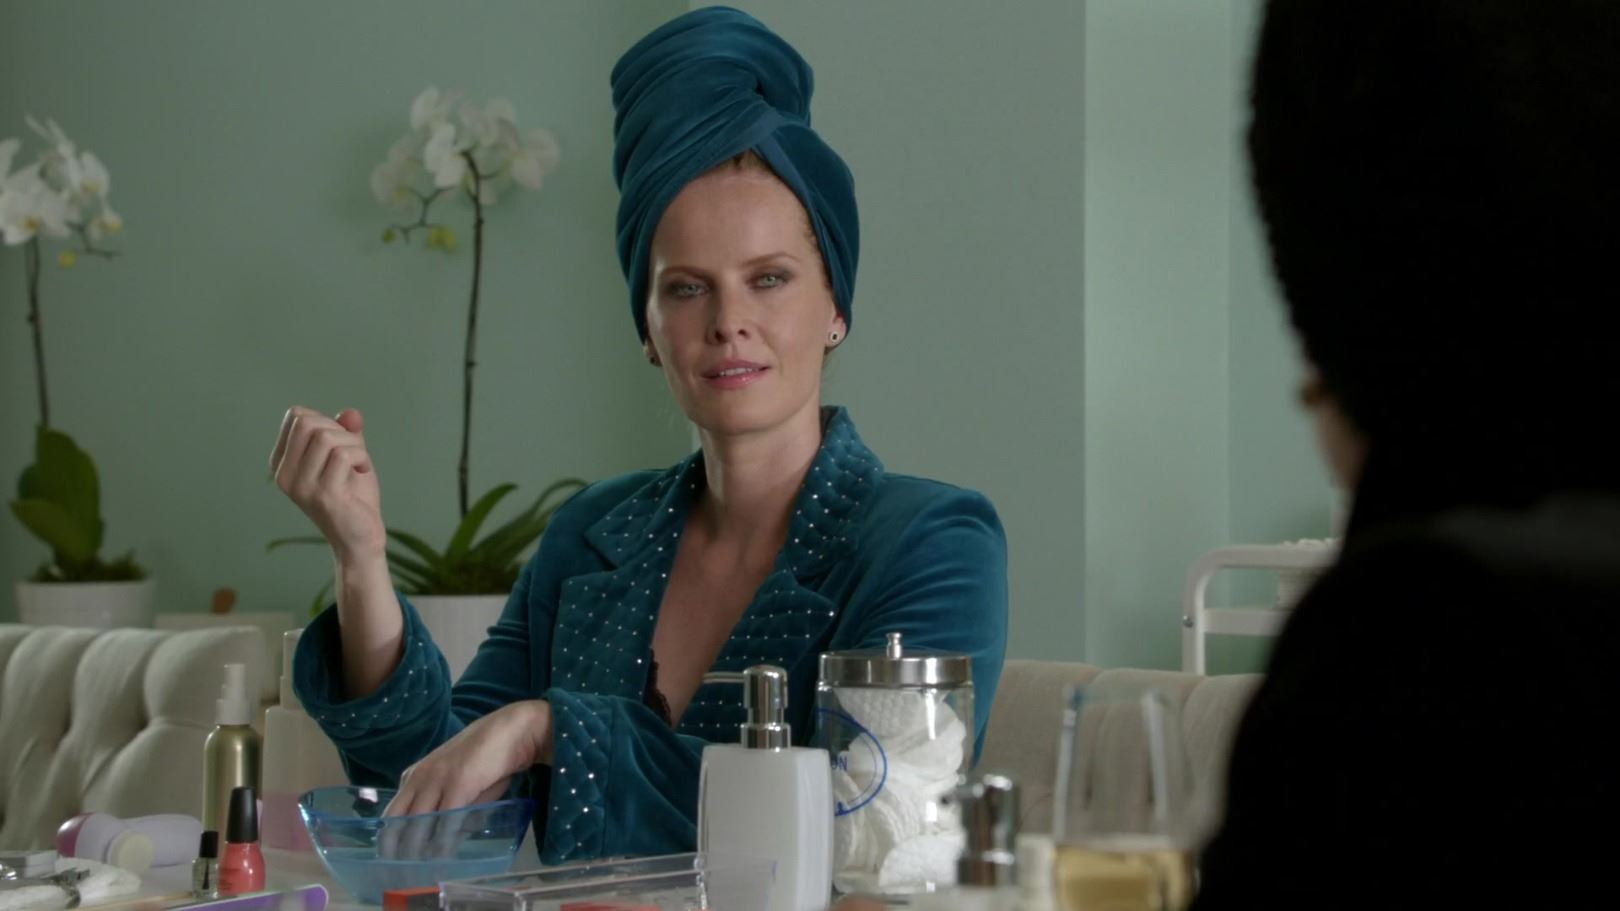 """Zelena"" velvet robe ensemble from Once Upon a Time Season 6, Episode 5"